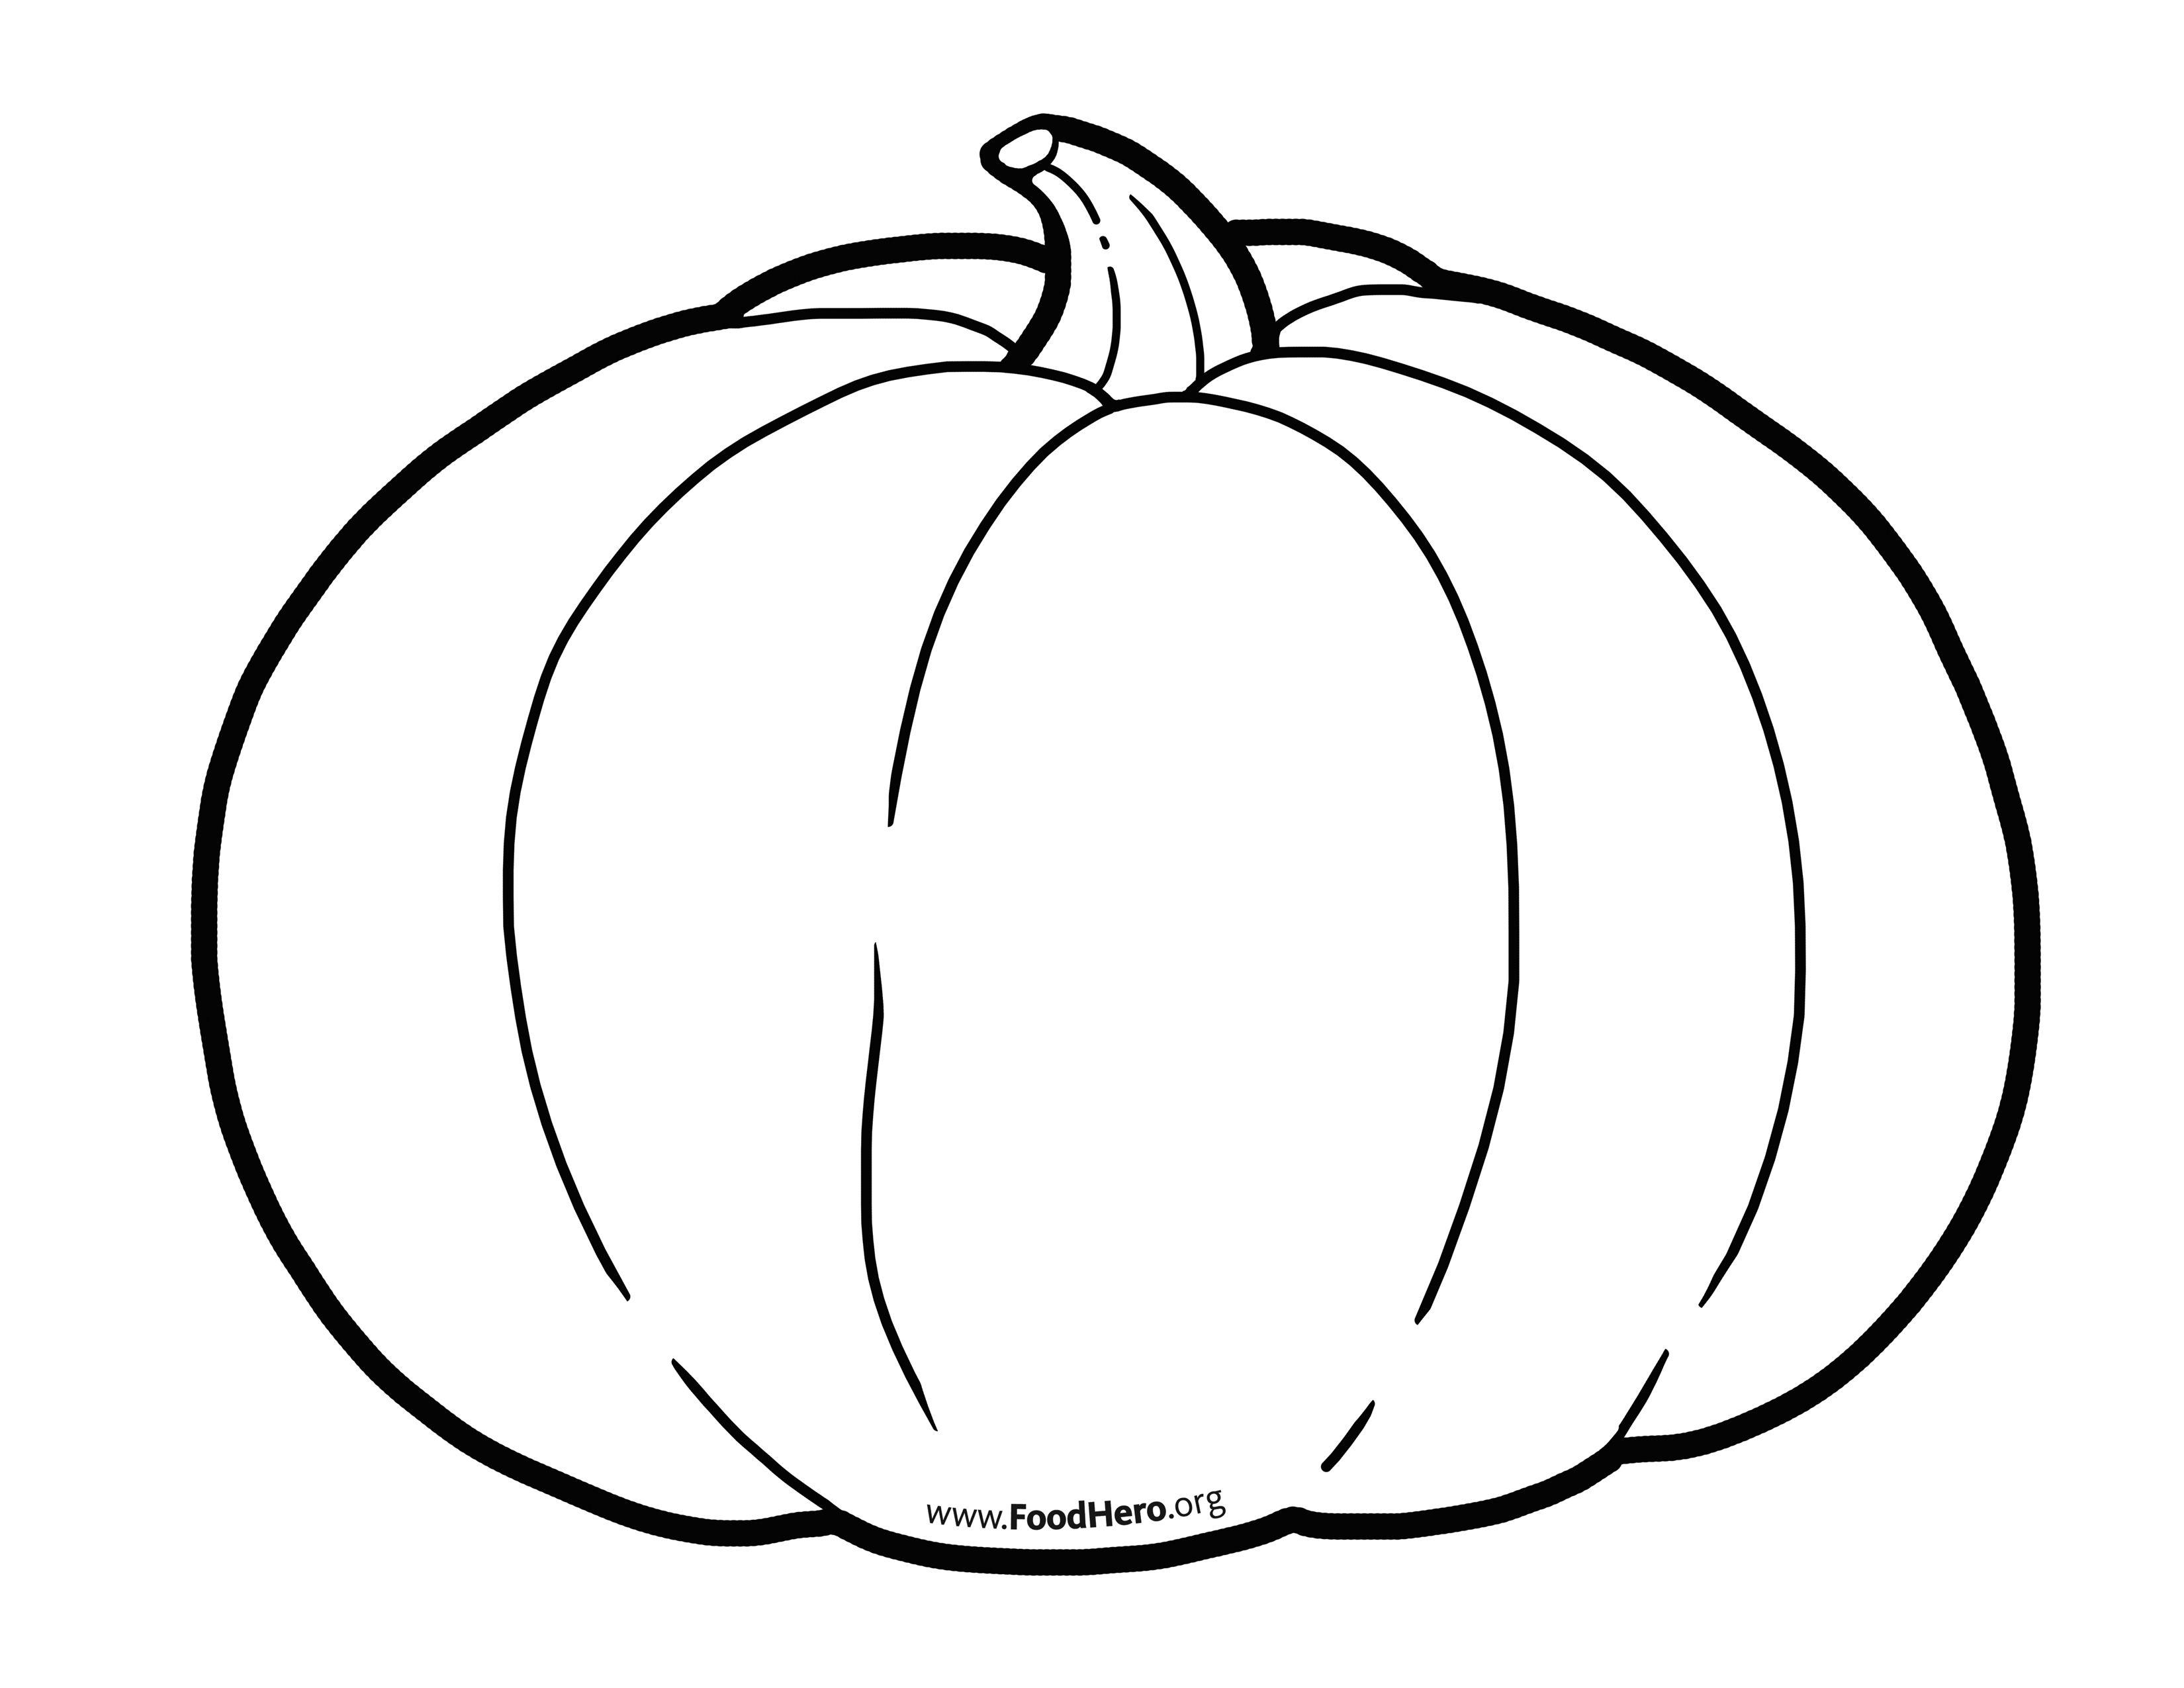 Pumpkin Illustration Foodhero Outline Bullentinboards Pumpkin Fruit Coloring Pages Pumpkin Drawing Paper Plate Crafts For Kids